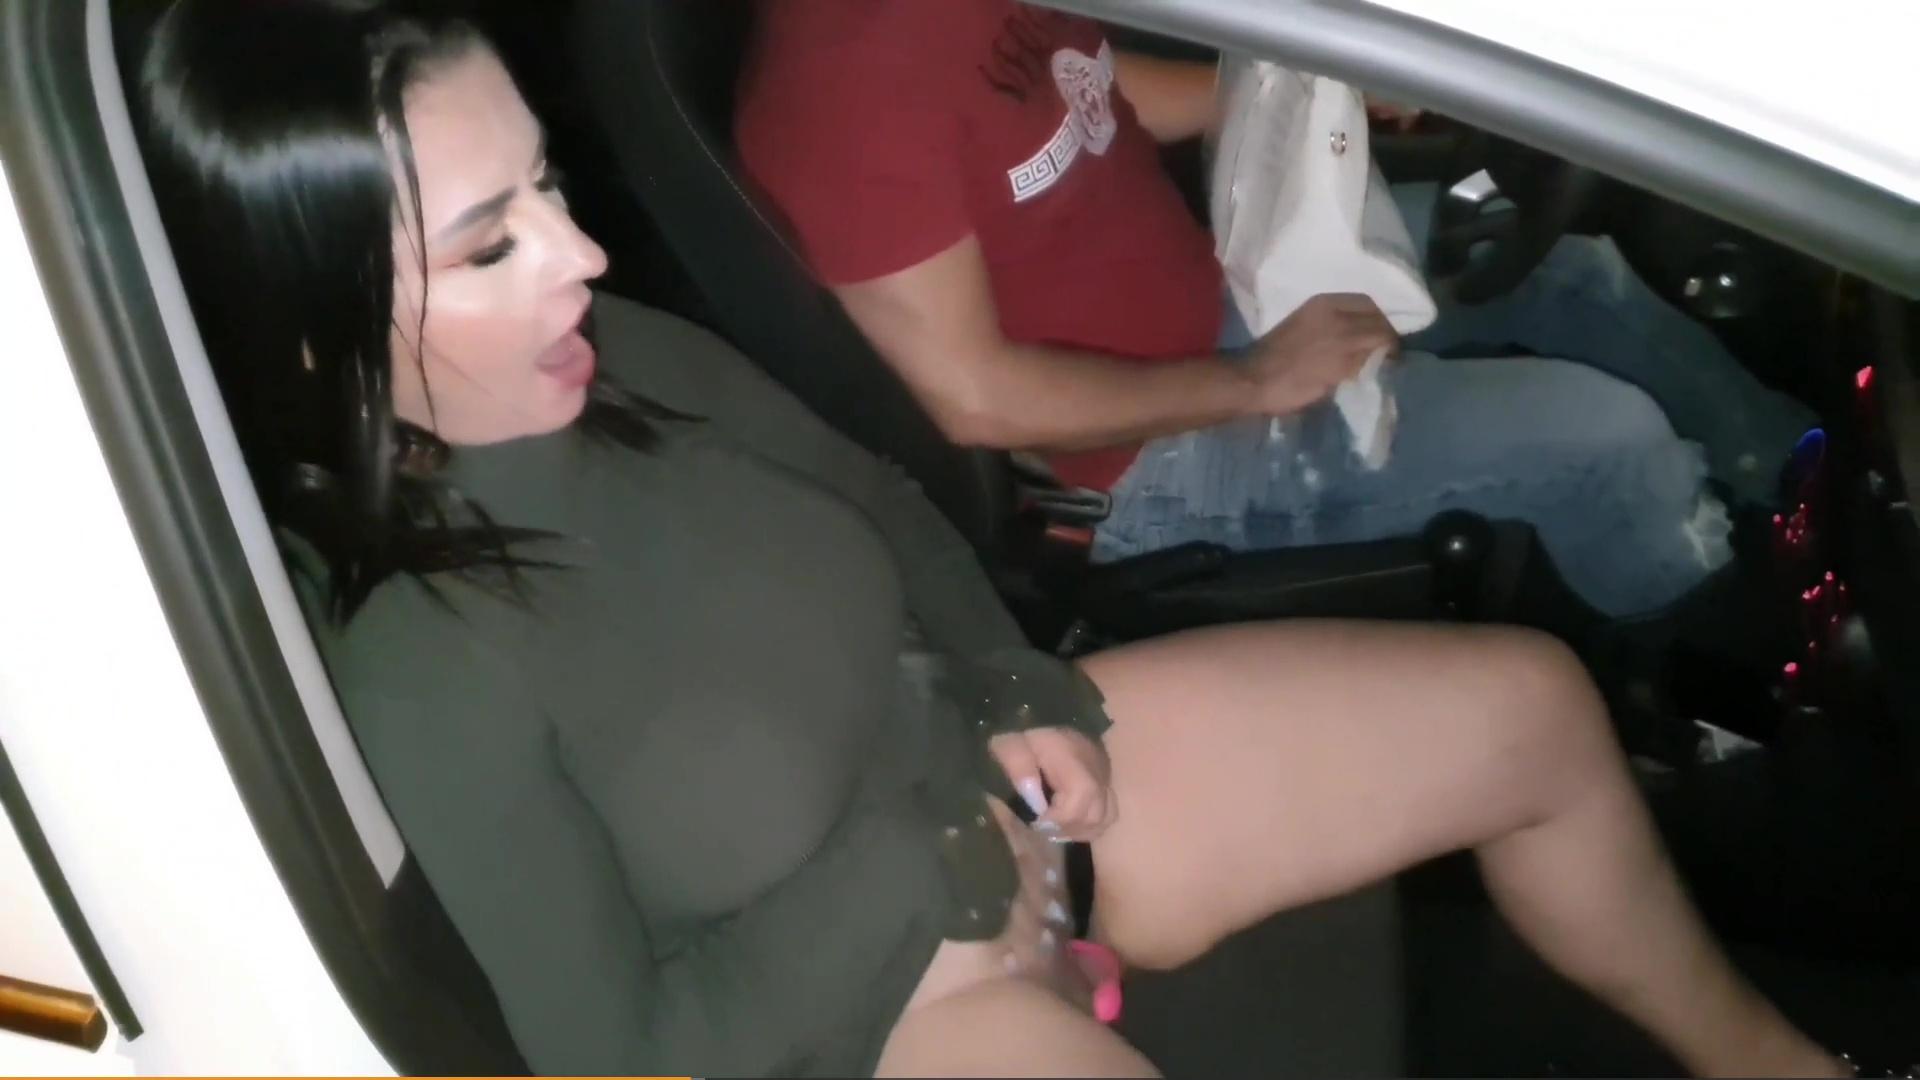 Fucked While Using Vibrator